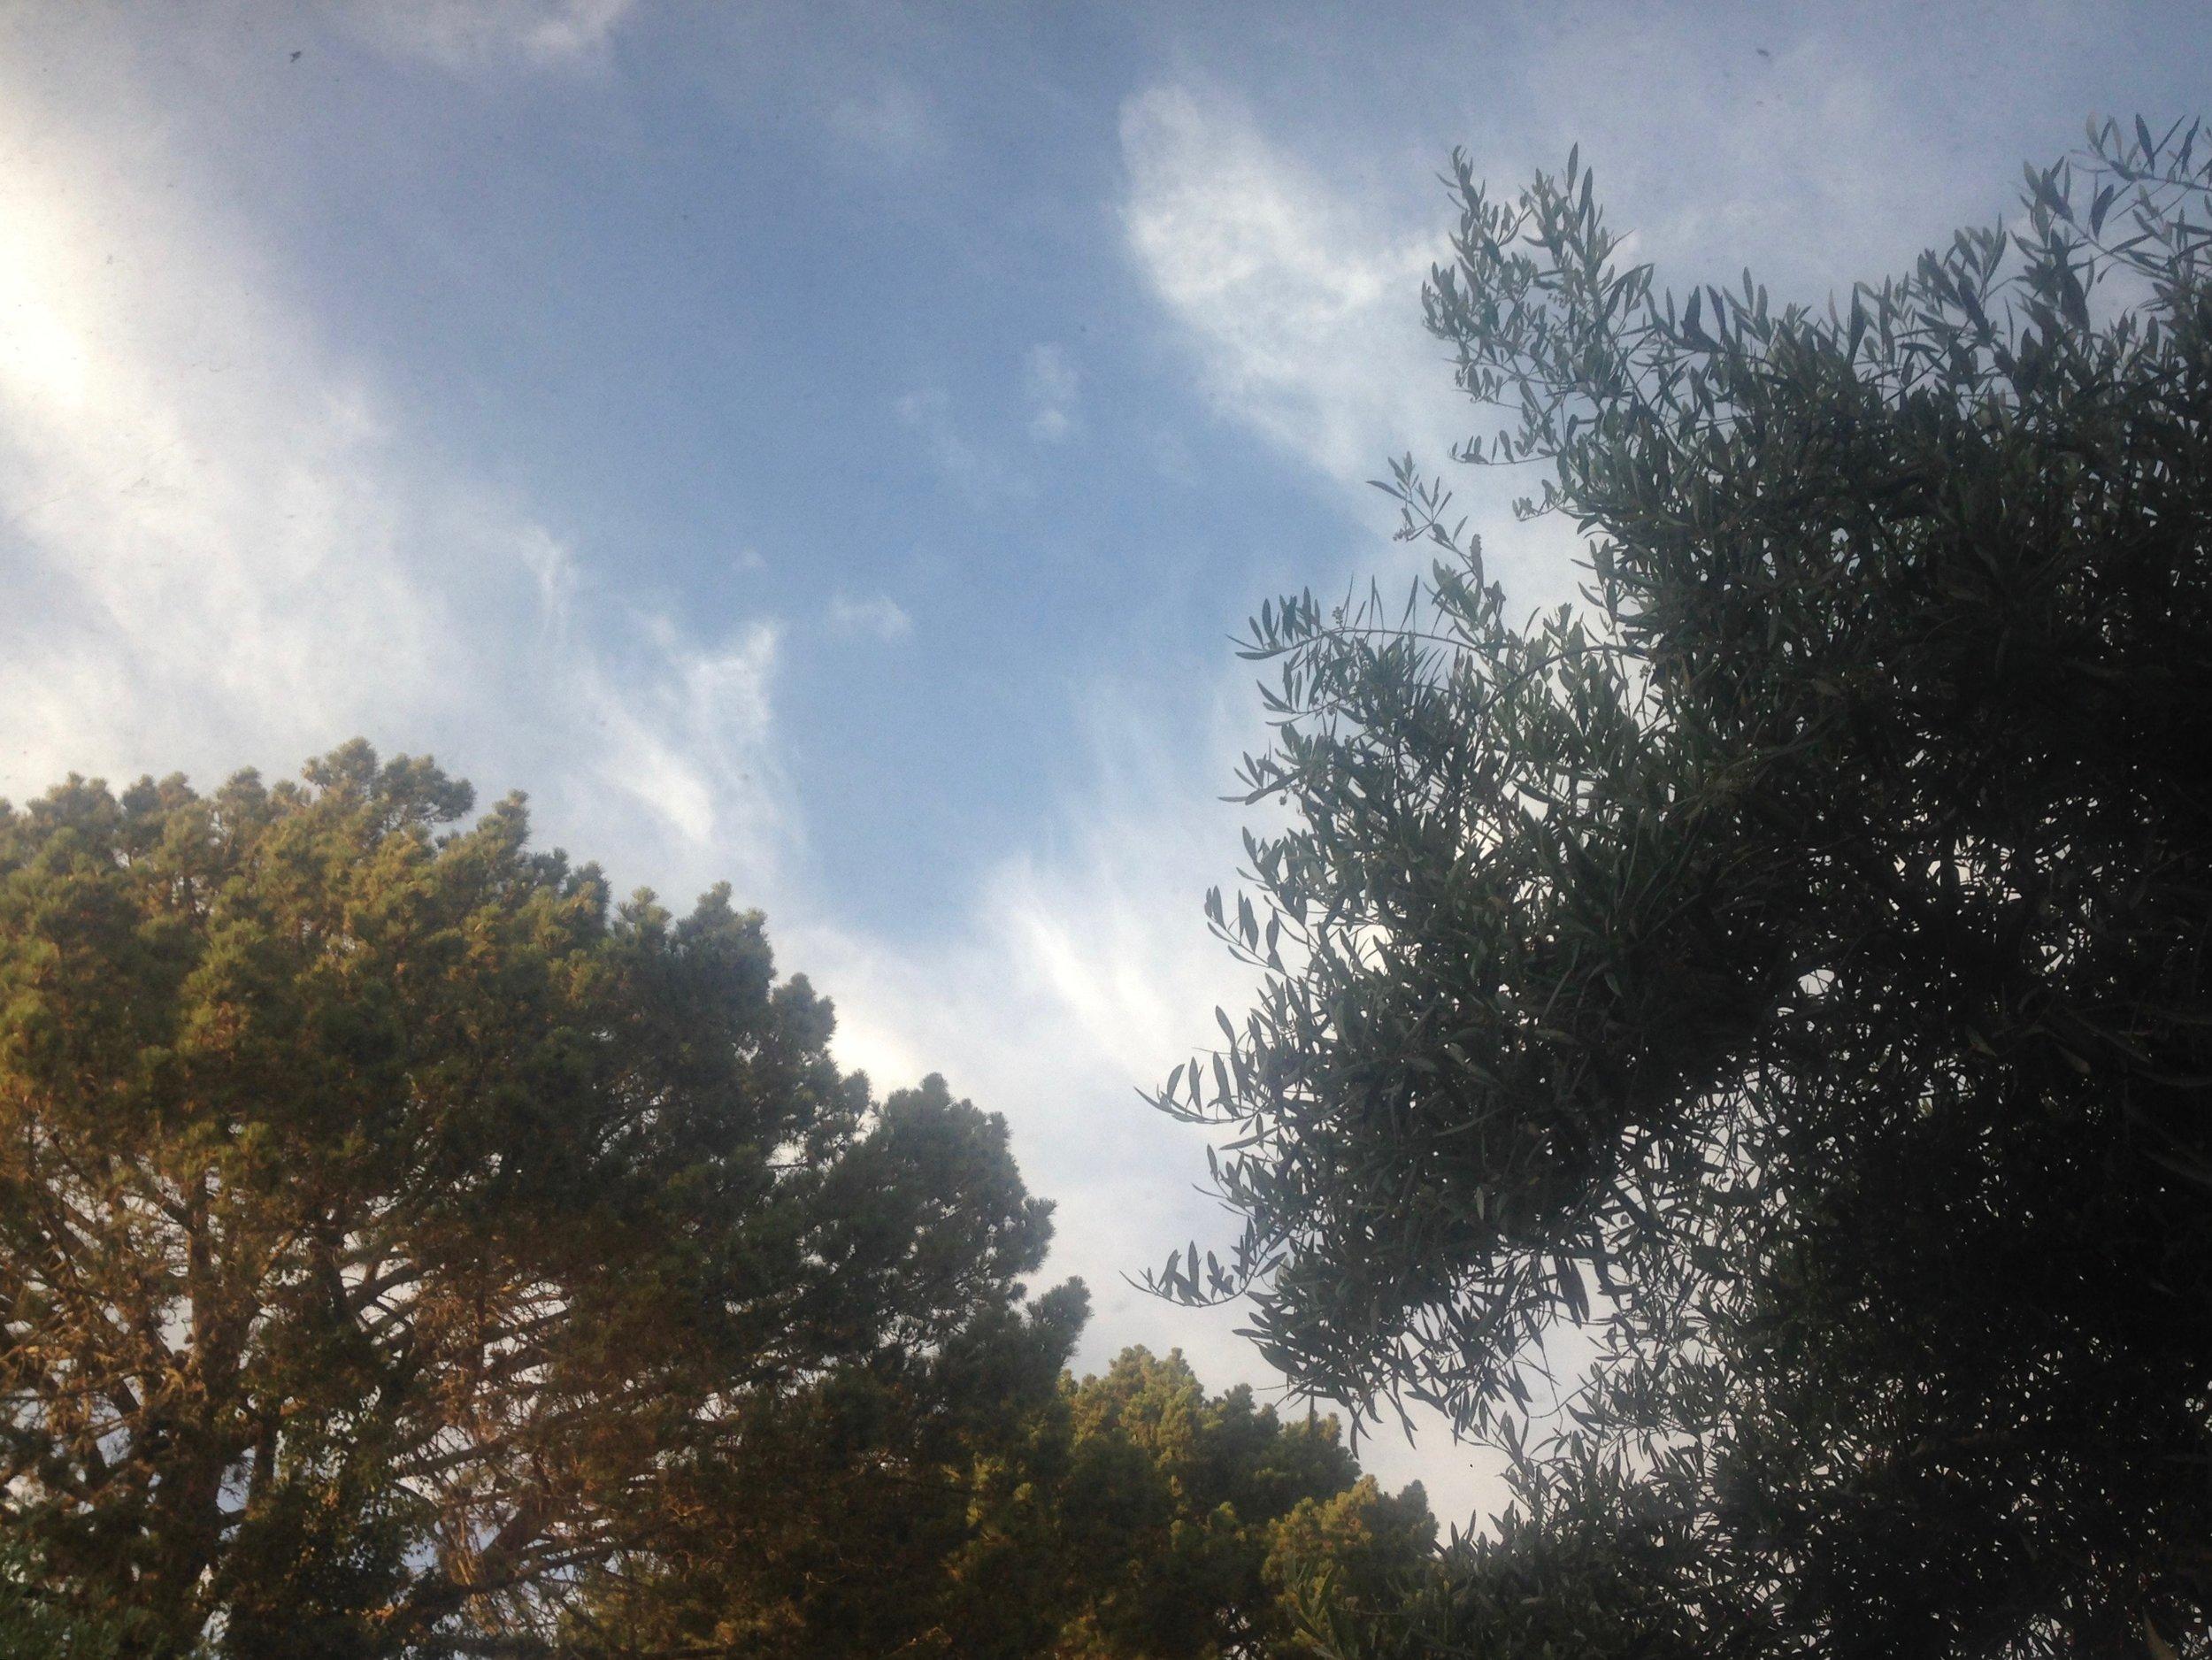 2019-07-30 Circles In The Sky.jpg